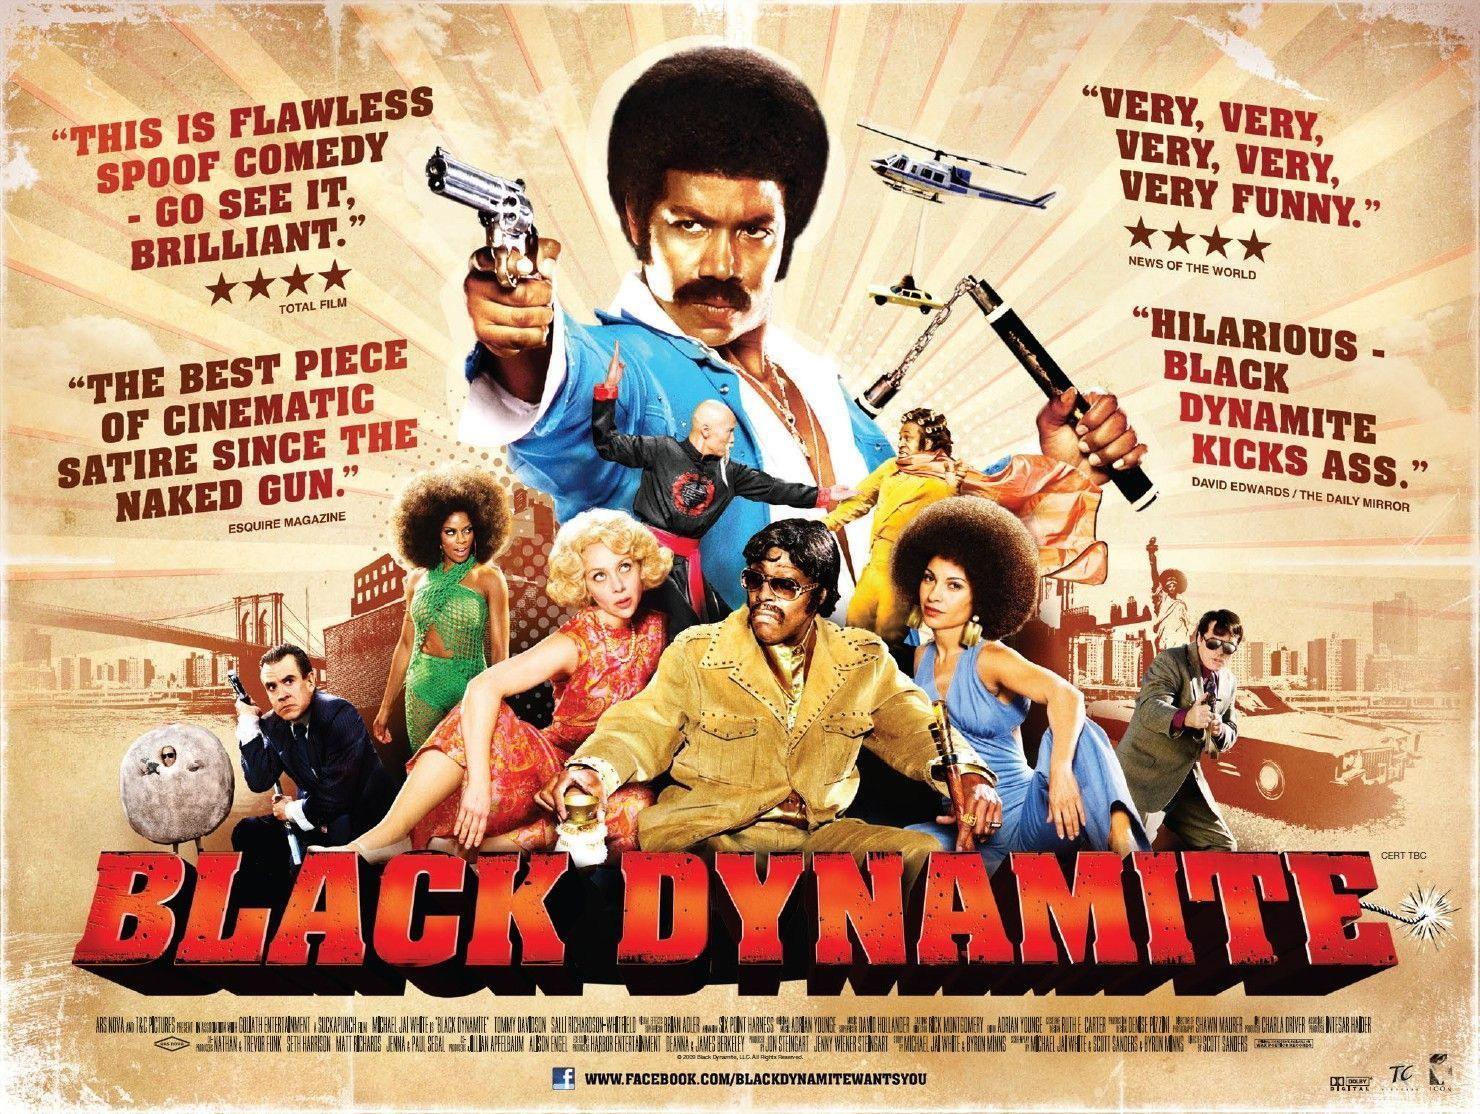 65174-BLACK-DYNAMITE-Blaxploitation-Shaft-Super-Fly-Wall-Print-Poster-Affiche